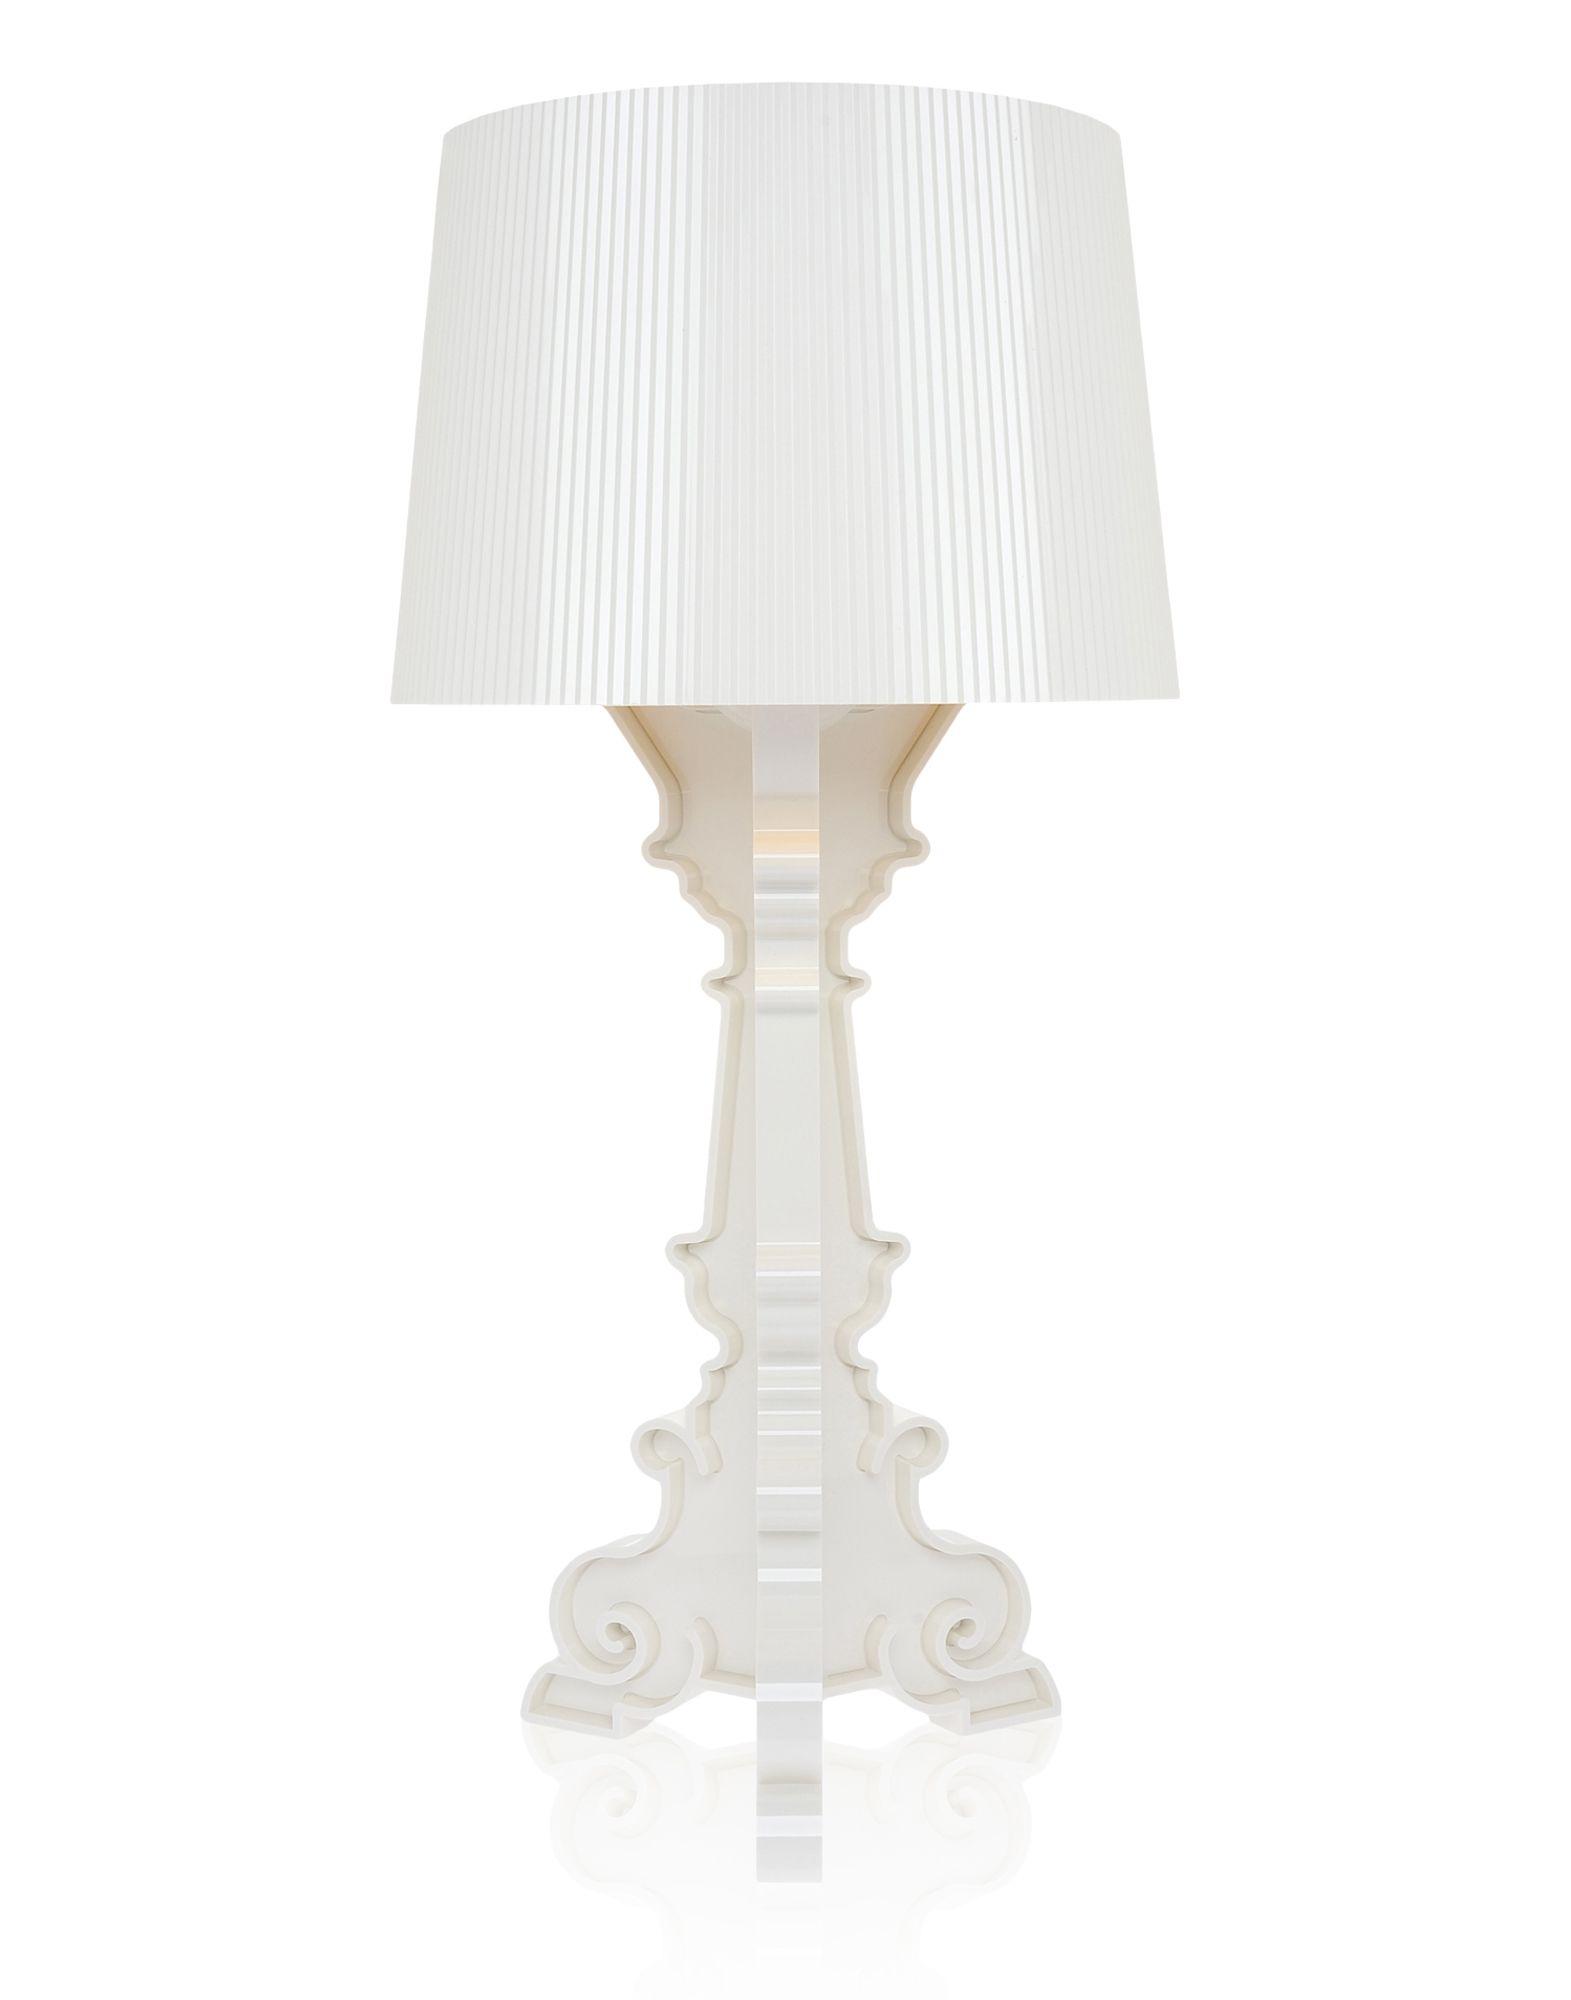 Lampada da Tavolo Kartell Bourgie Bianco Oro, Newformsdesign | Lampade da  Tavolo | Newformsdesign